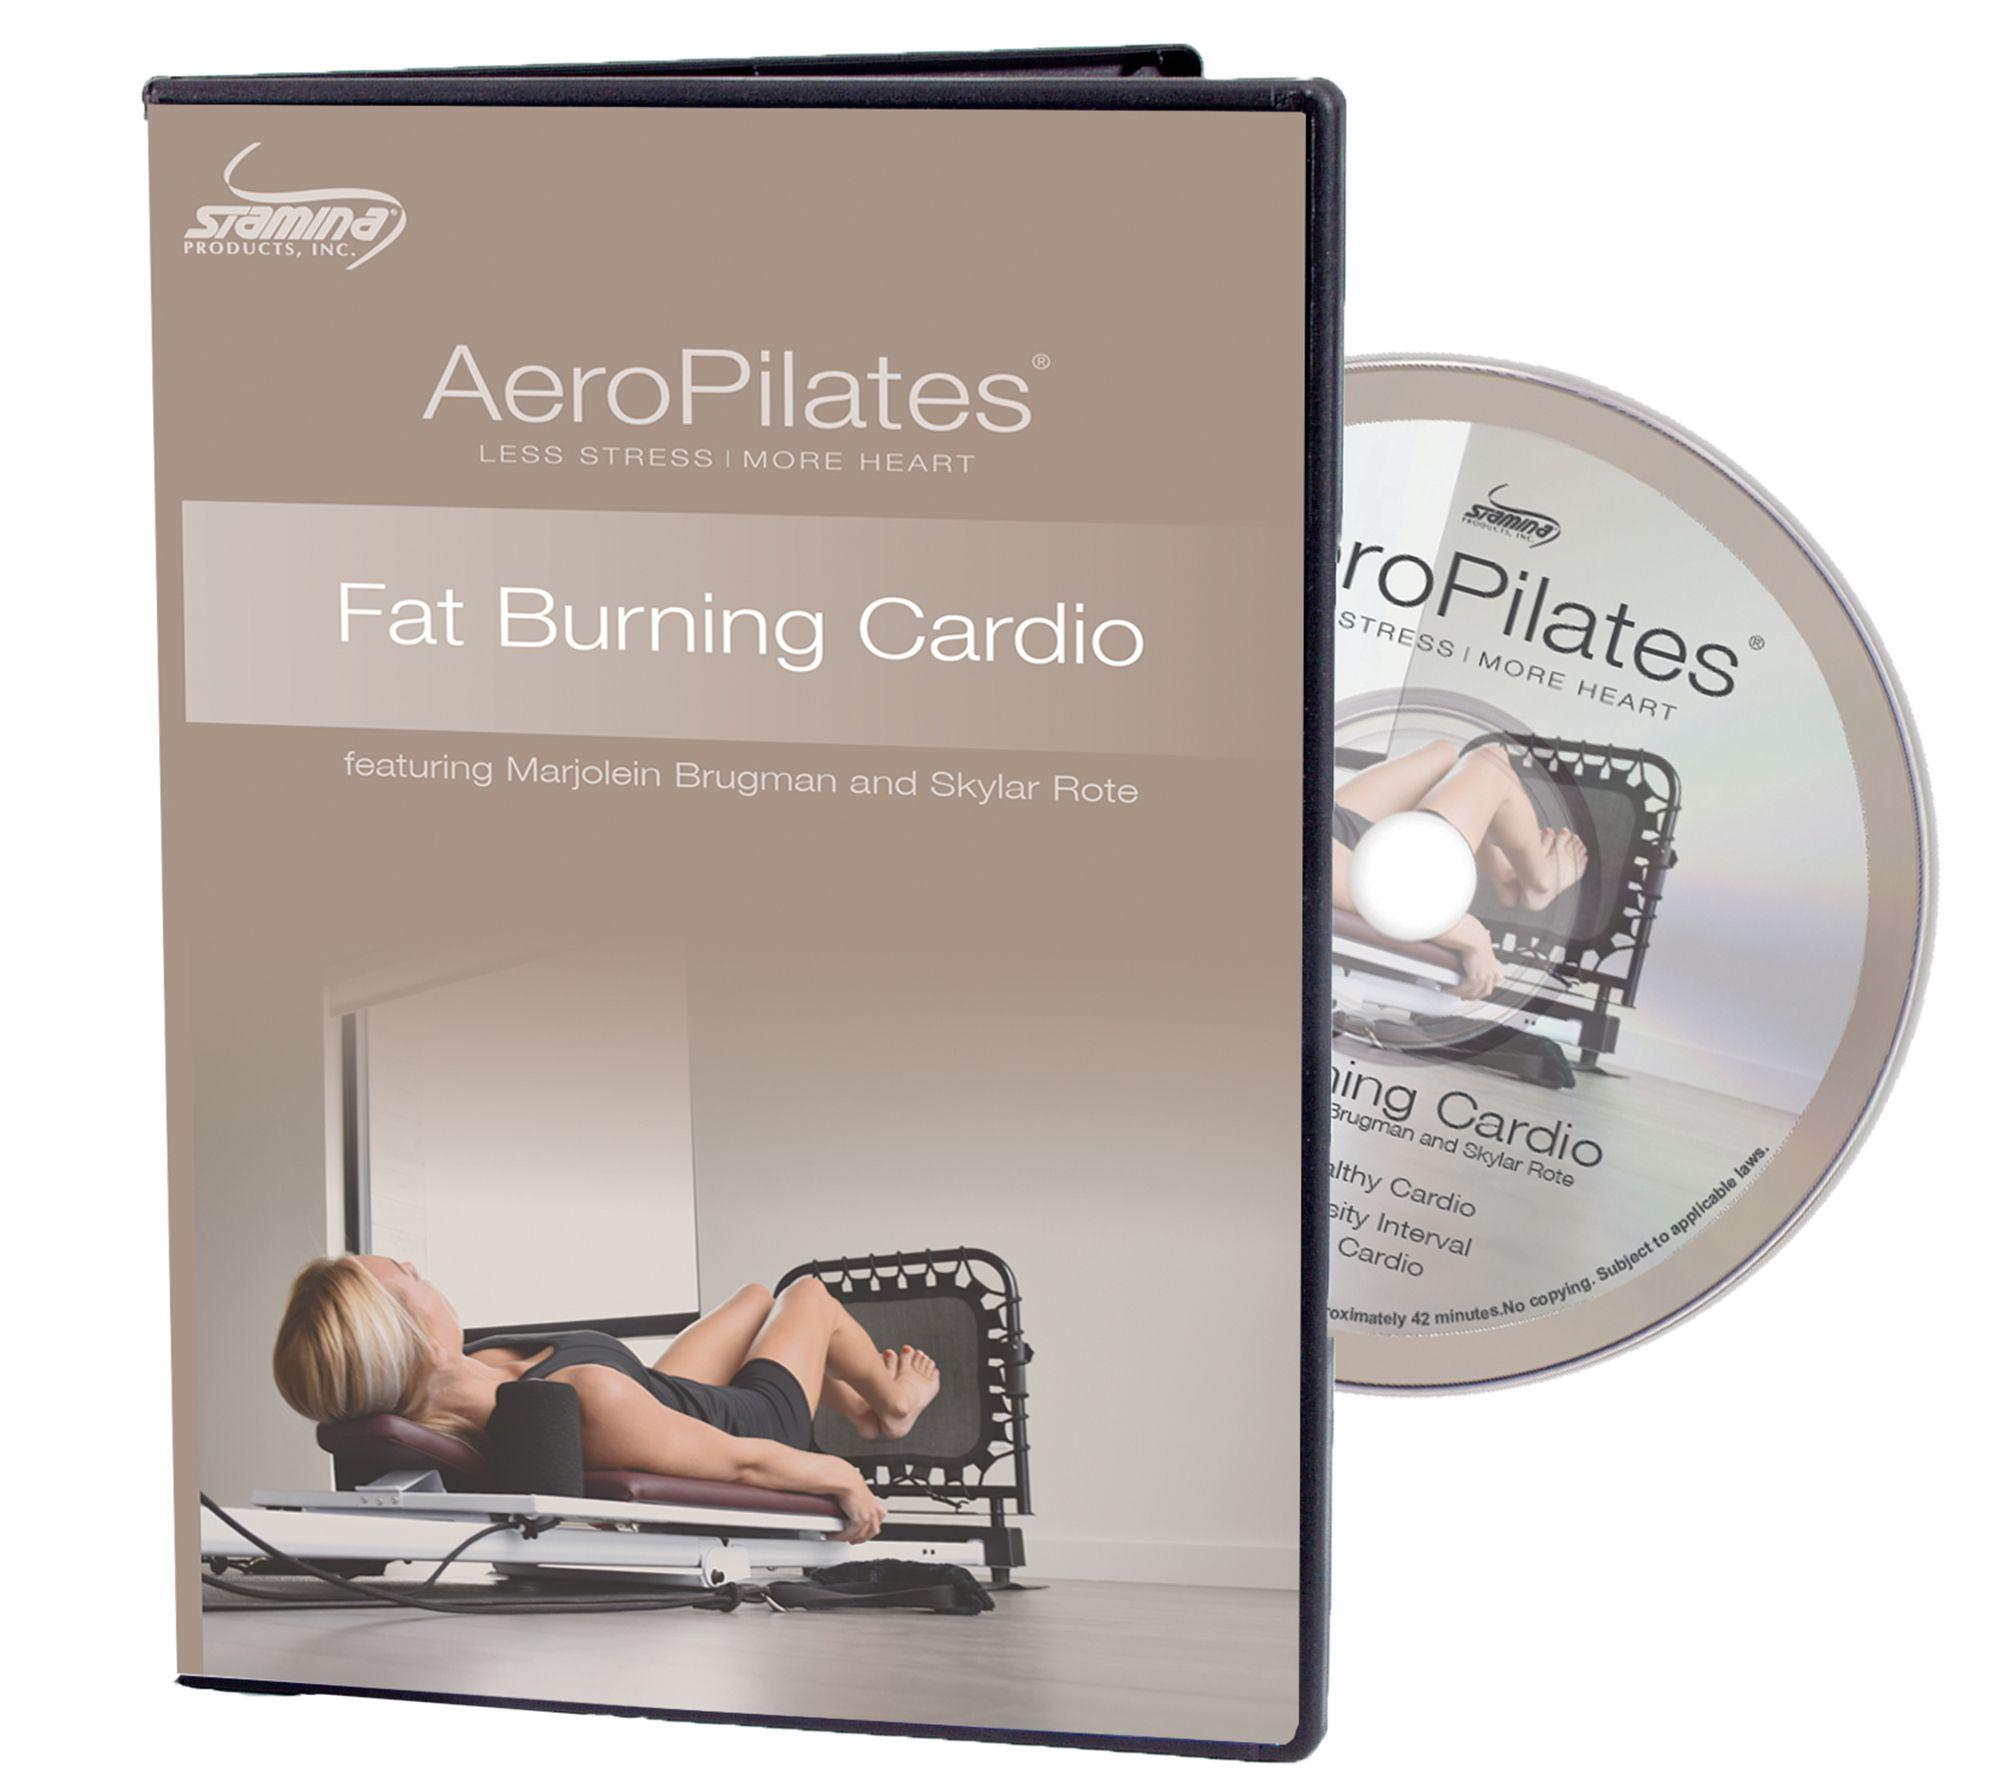 aeropilates fat burning cardio dvd page 1 qvc